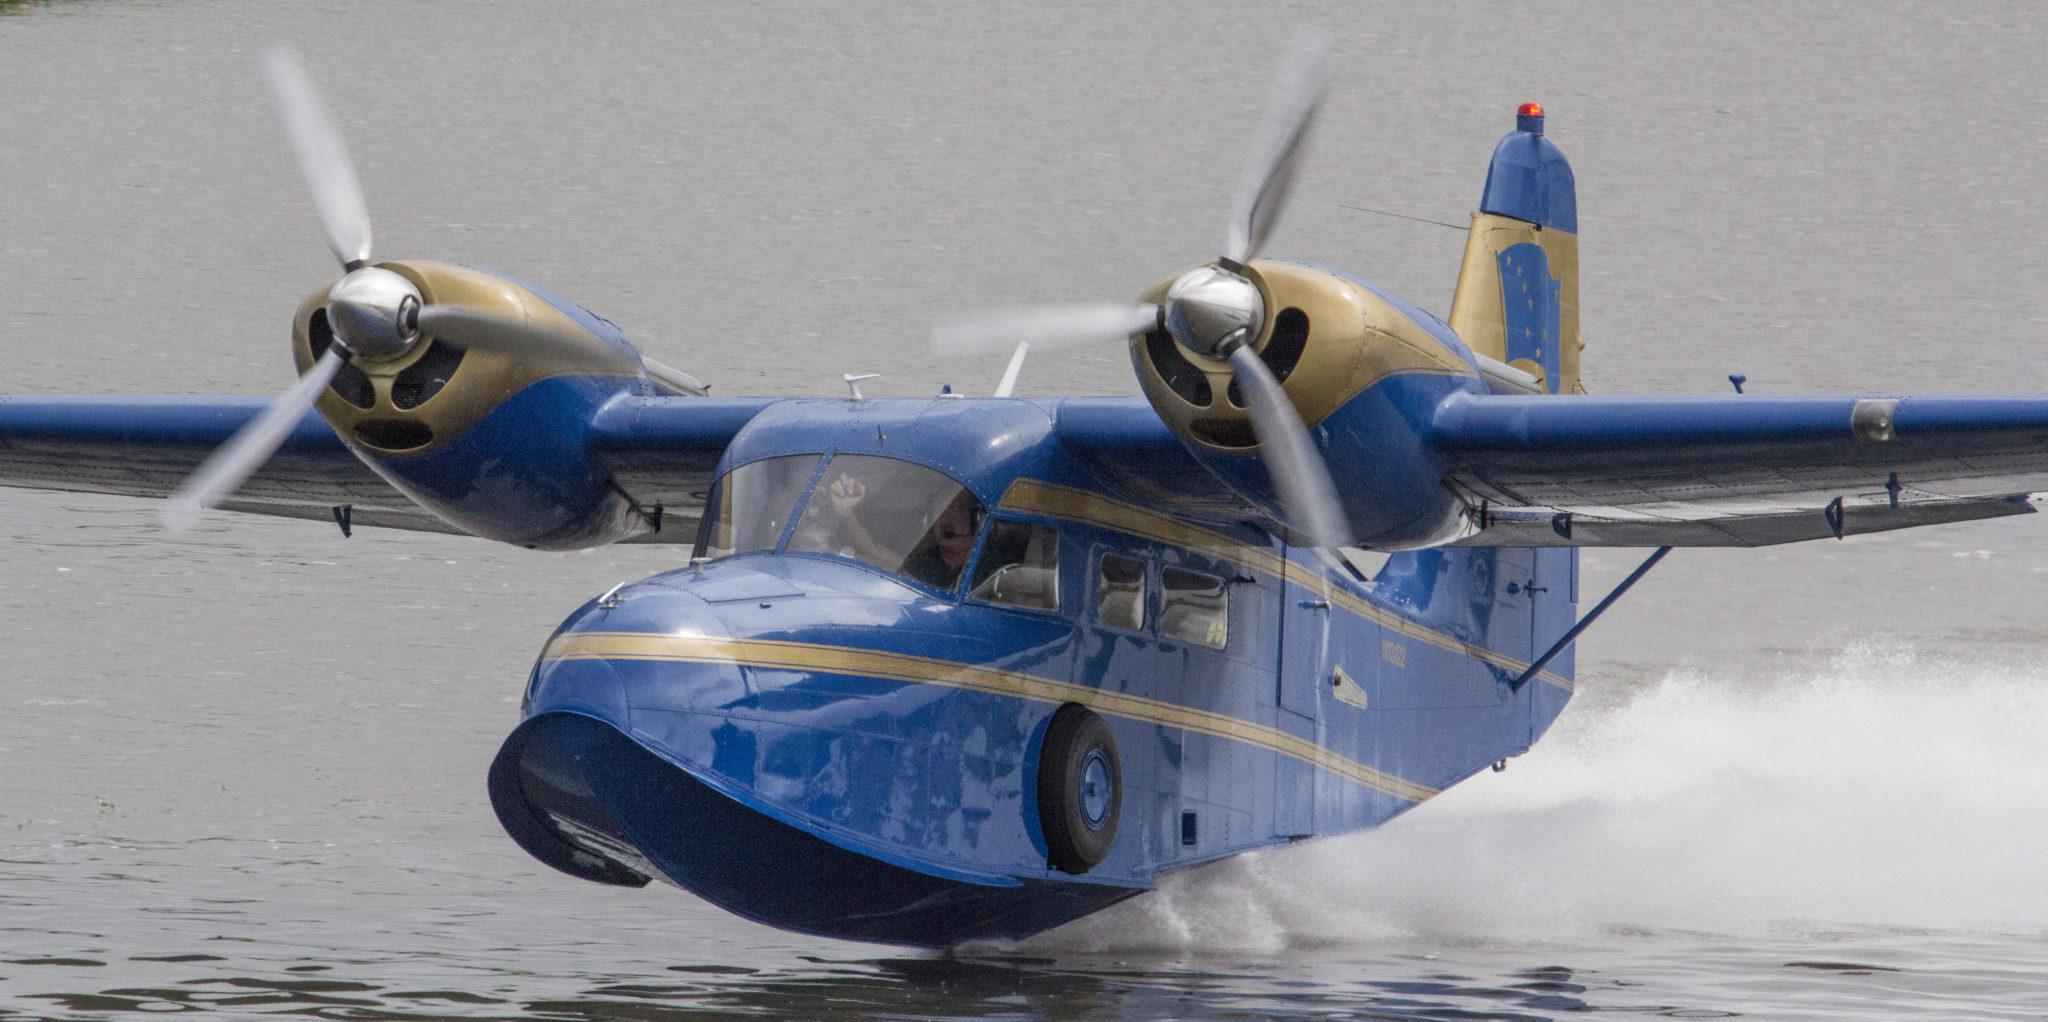 Alaska aviation image McGoffin Widgeon | Aviation Photography | Alaskafoto